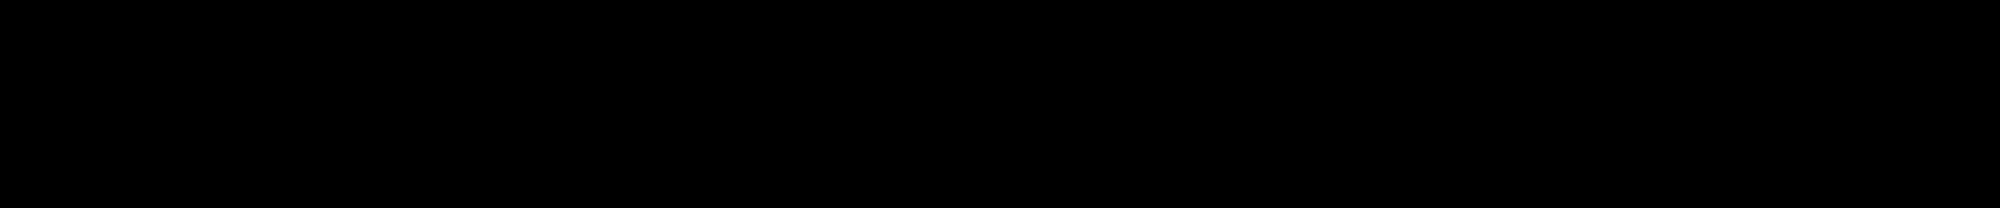 walter-knoll-logo-3bb90023_gross